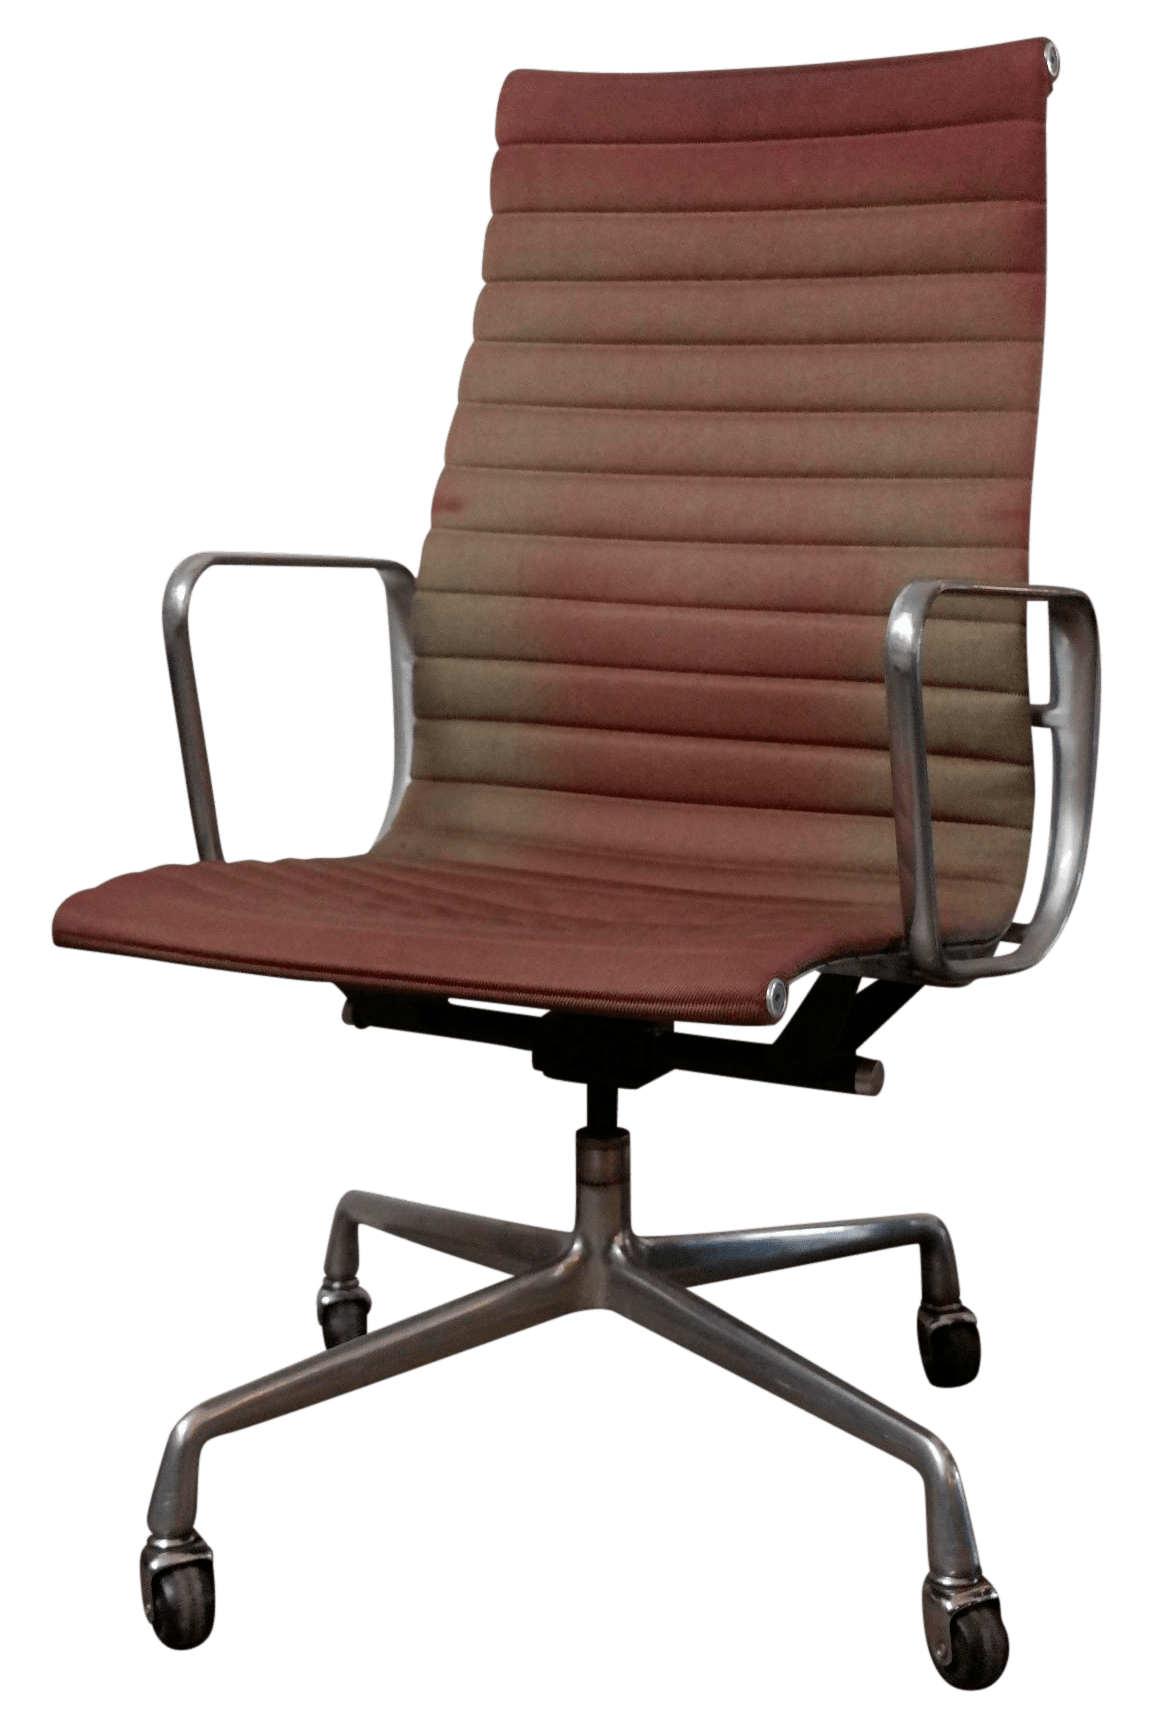 Eames Group Executive Desk Chair  Chairish